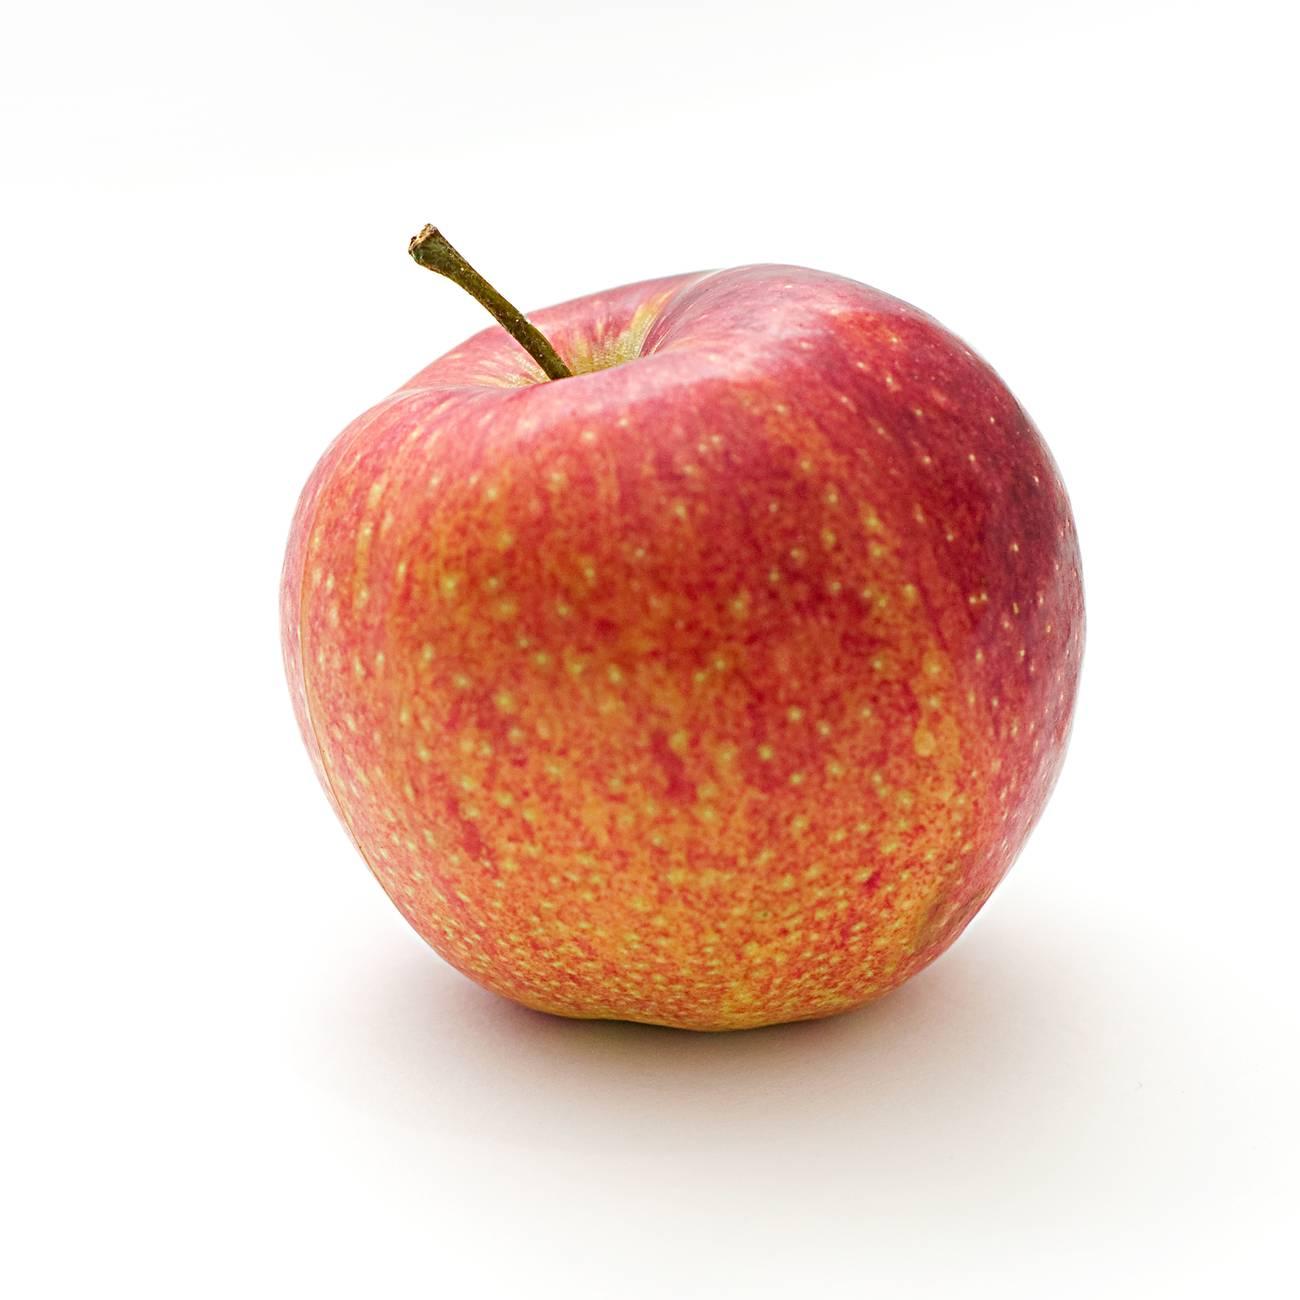 healthy apple fruits natural